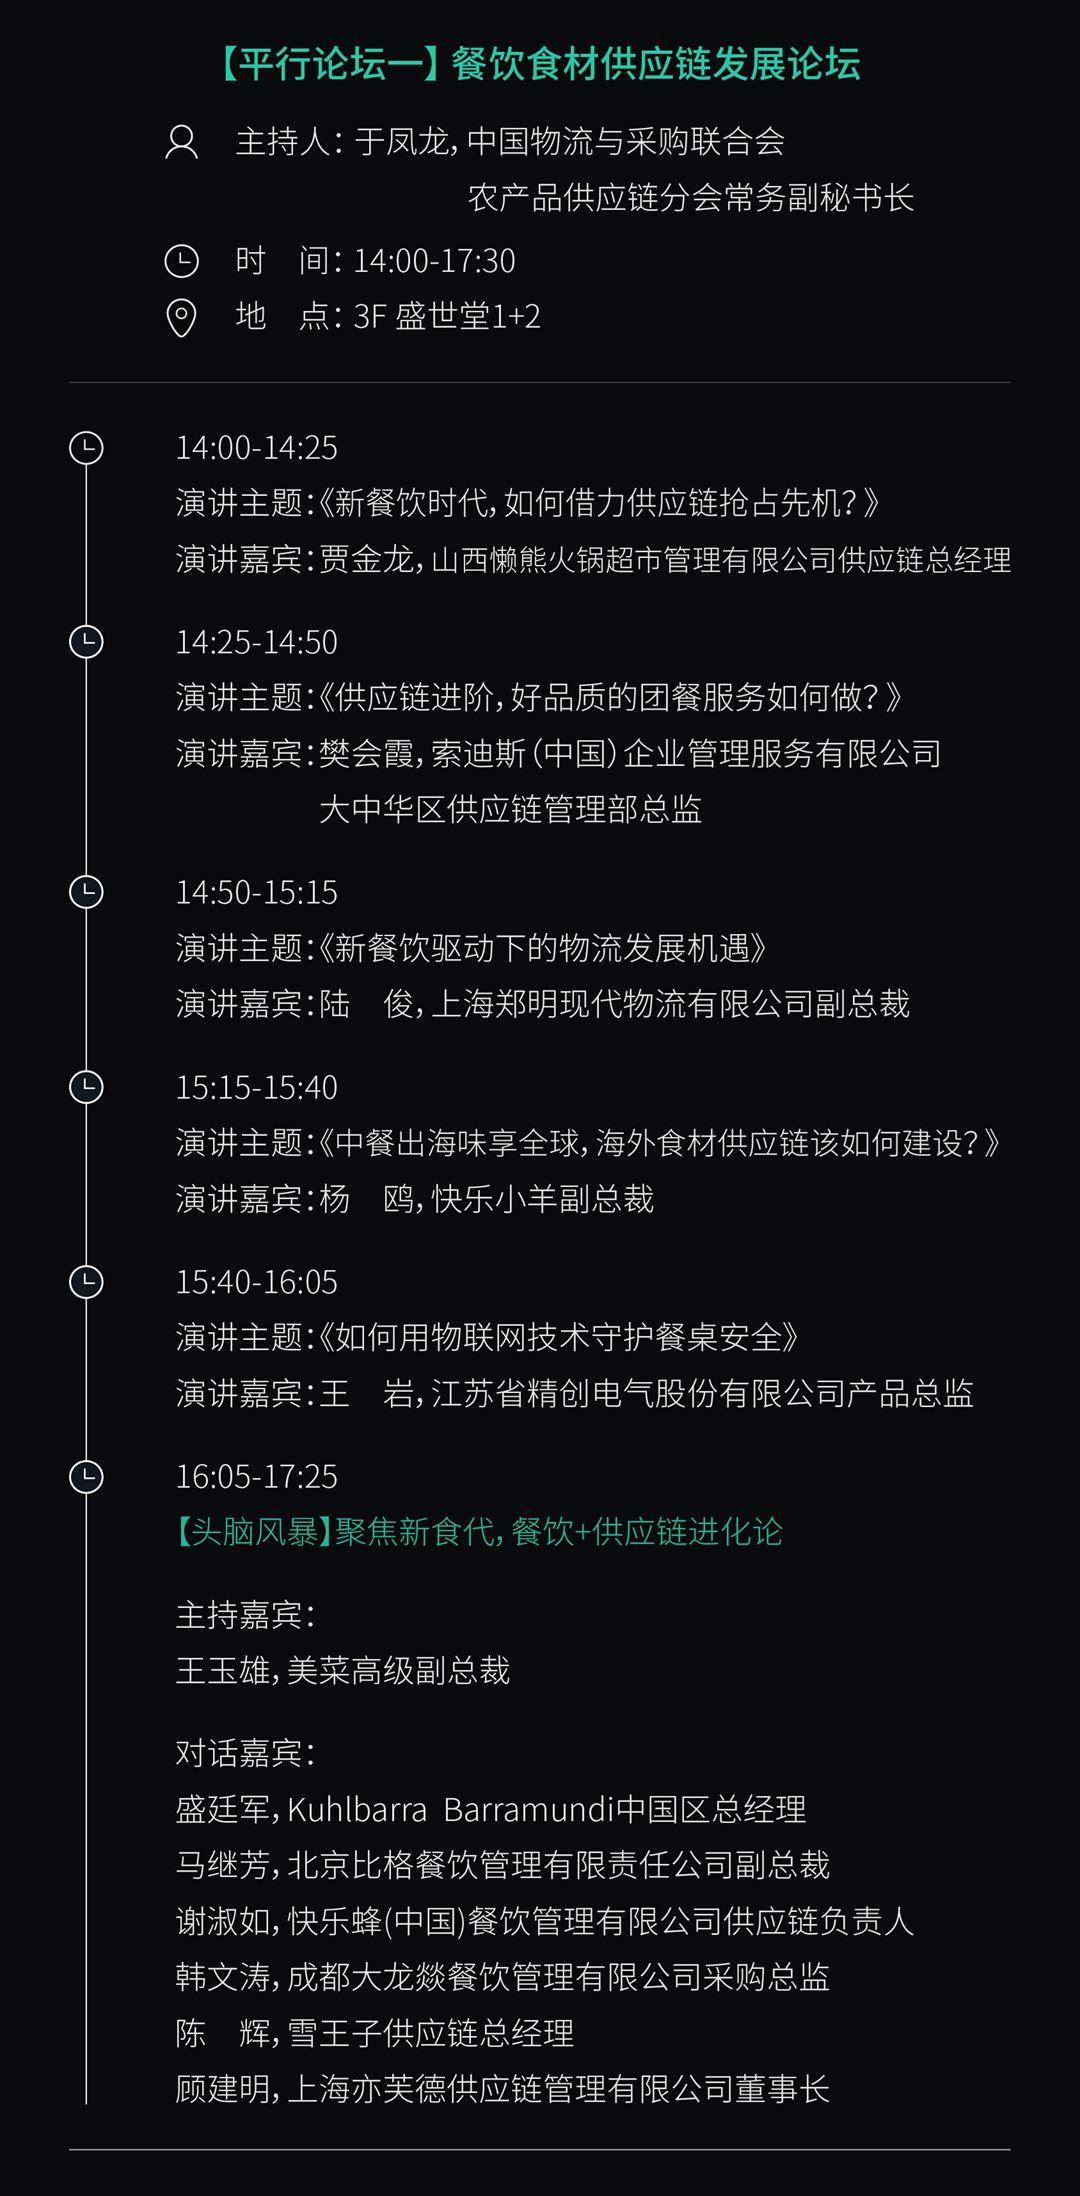 【20210511】议程长图_画板-1_04.png